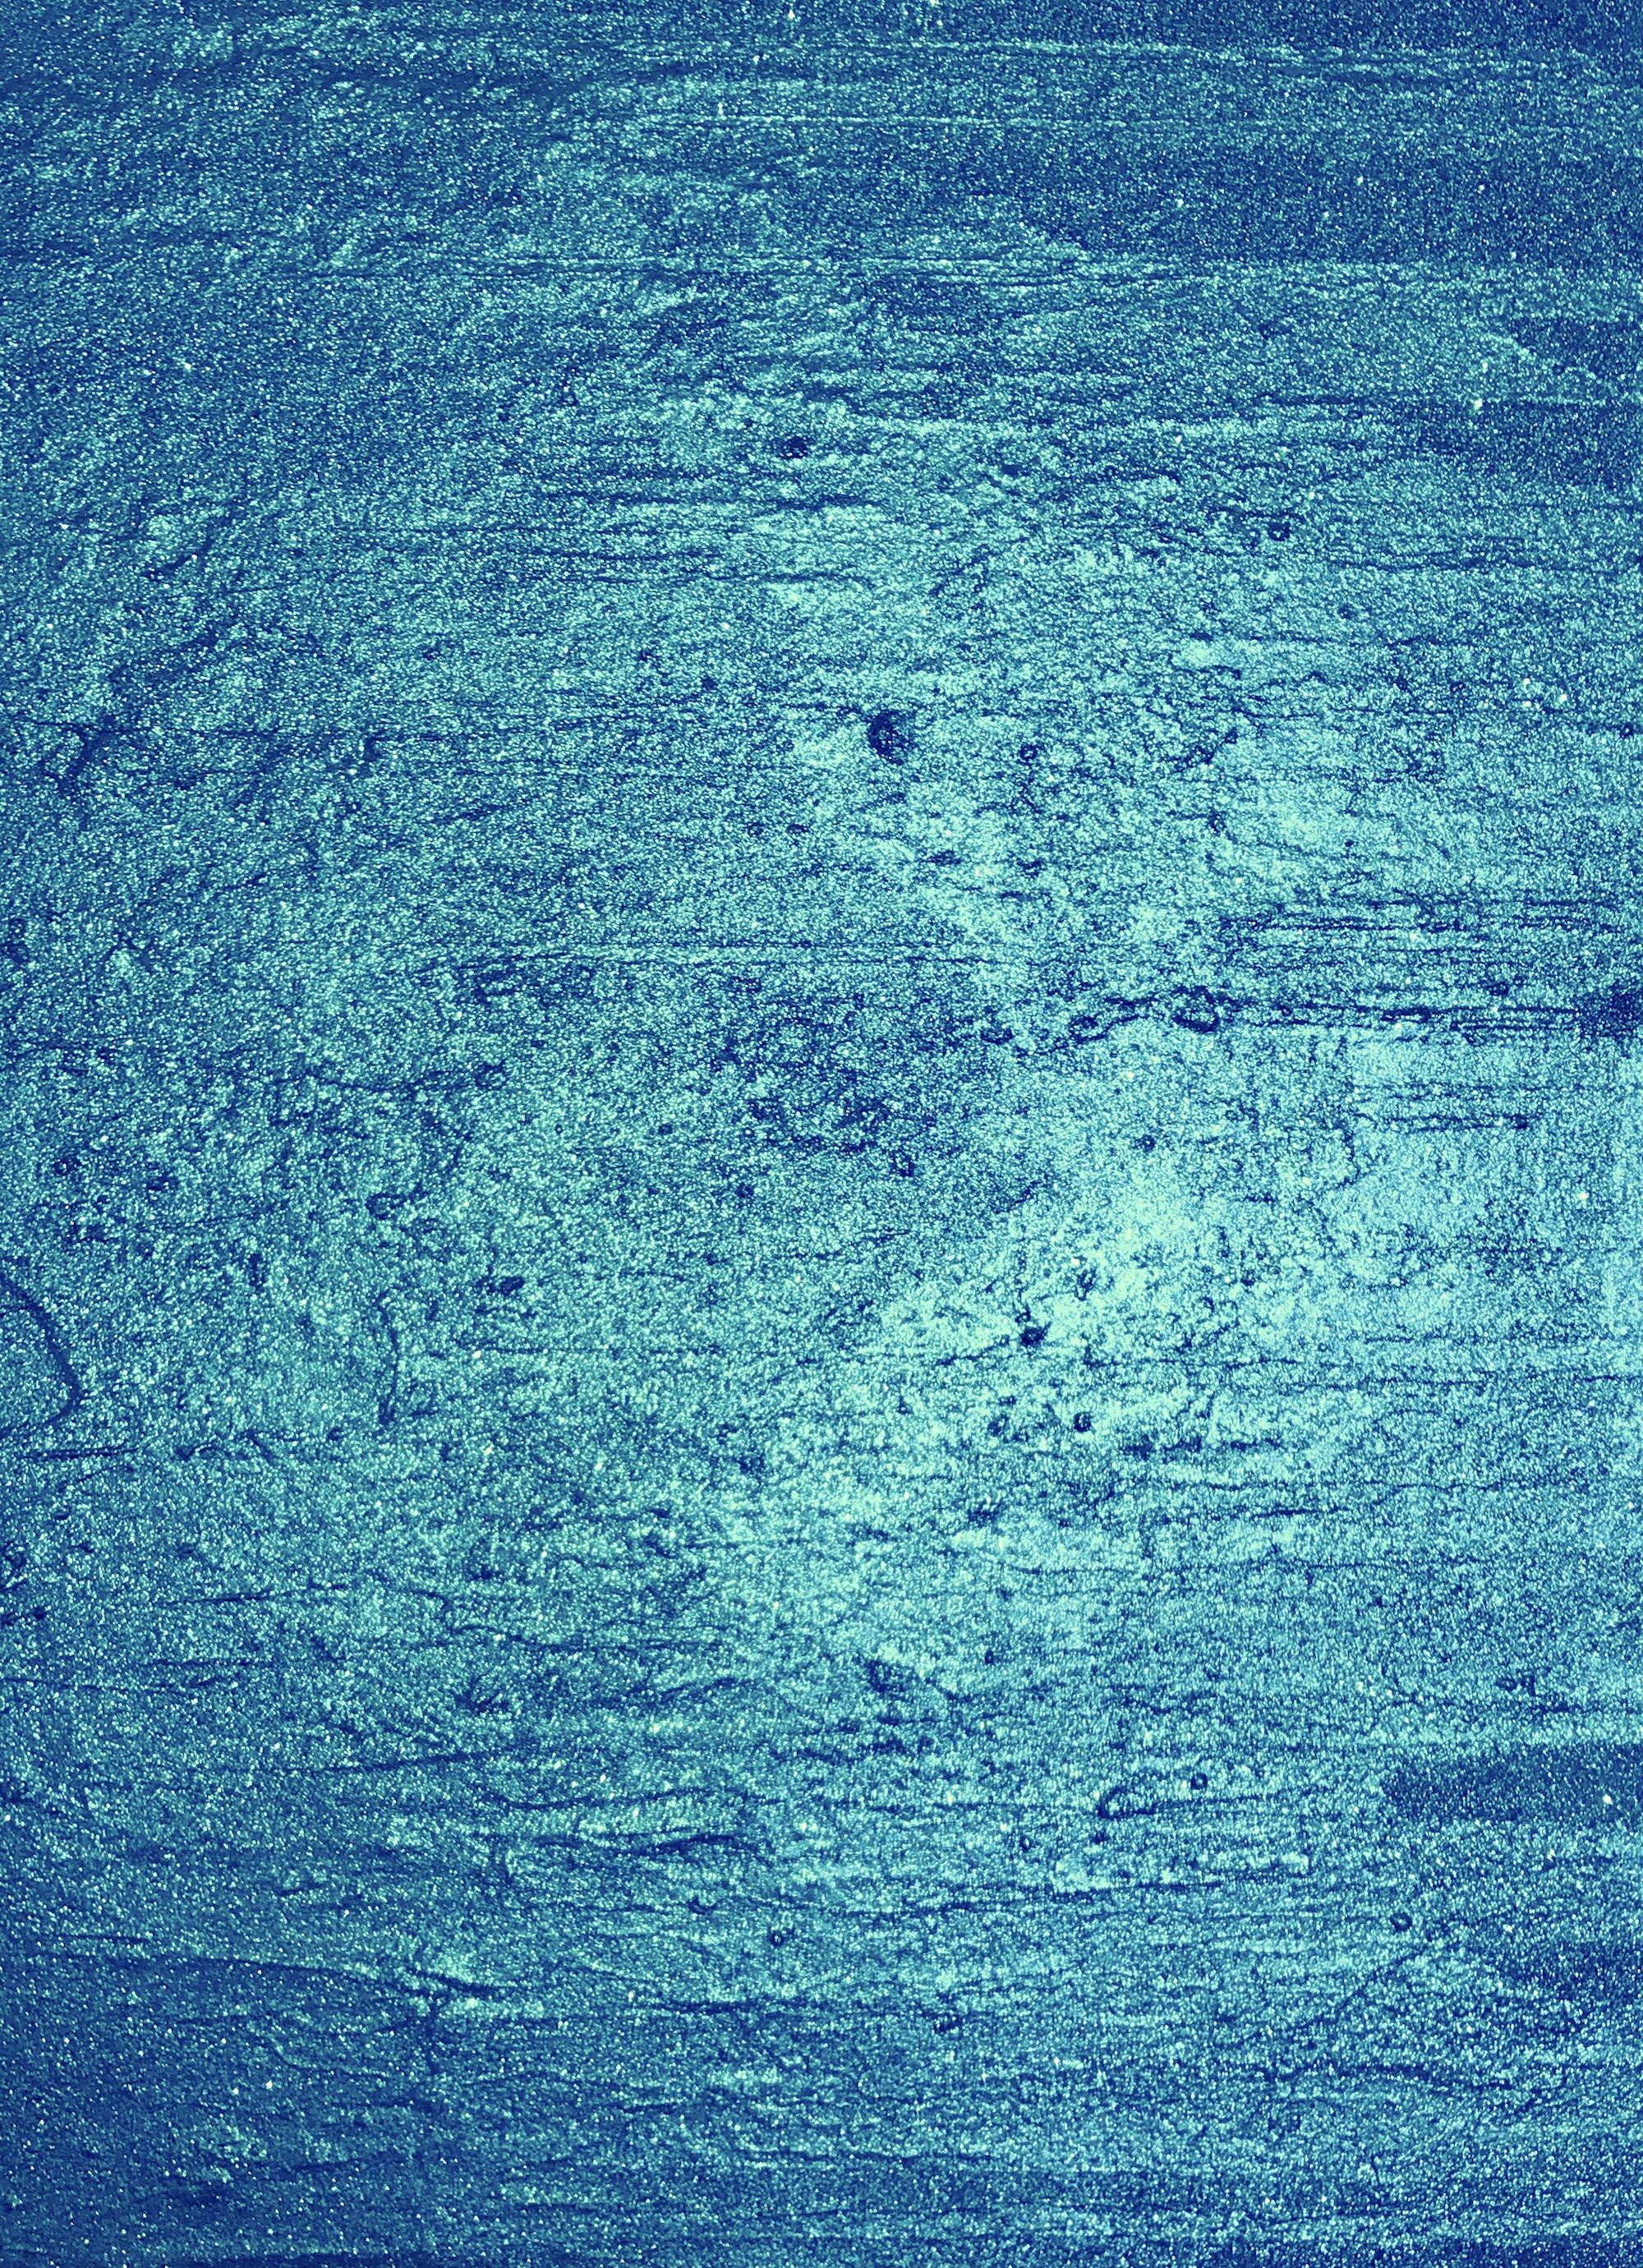 Impurities. 40x30. Carina Sohaili.